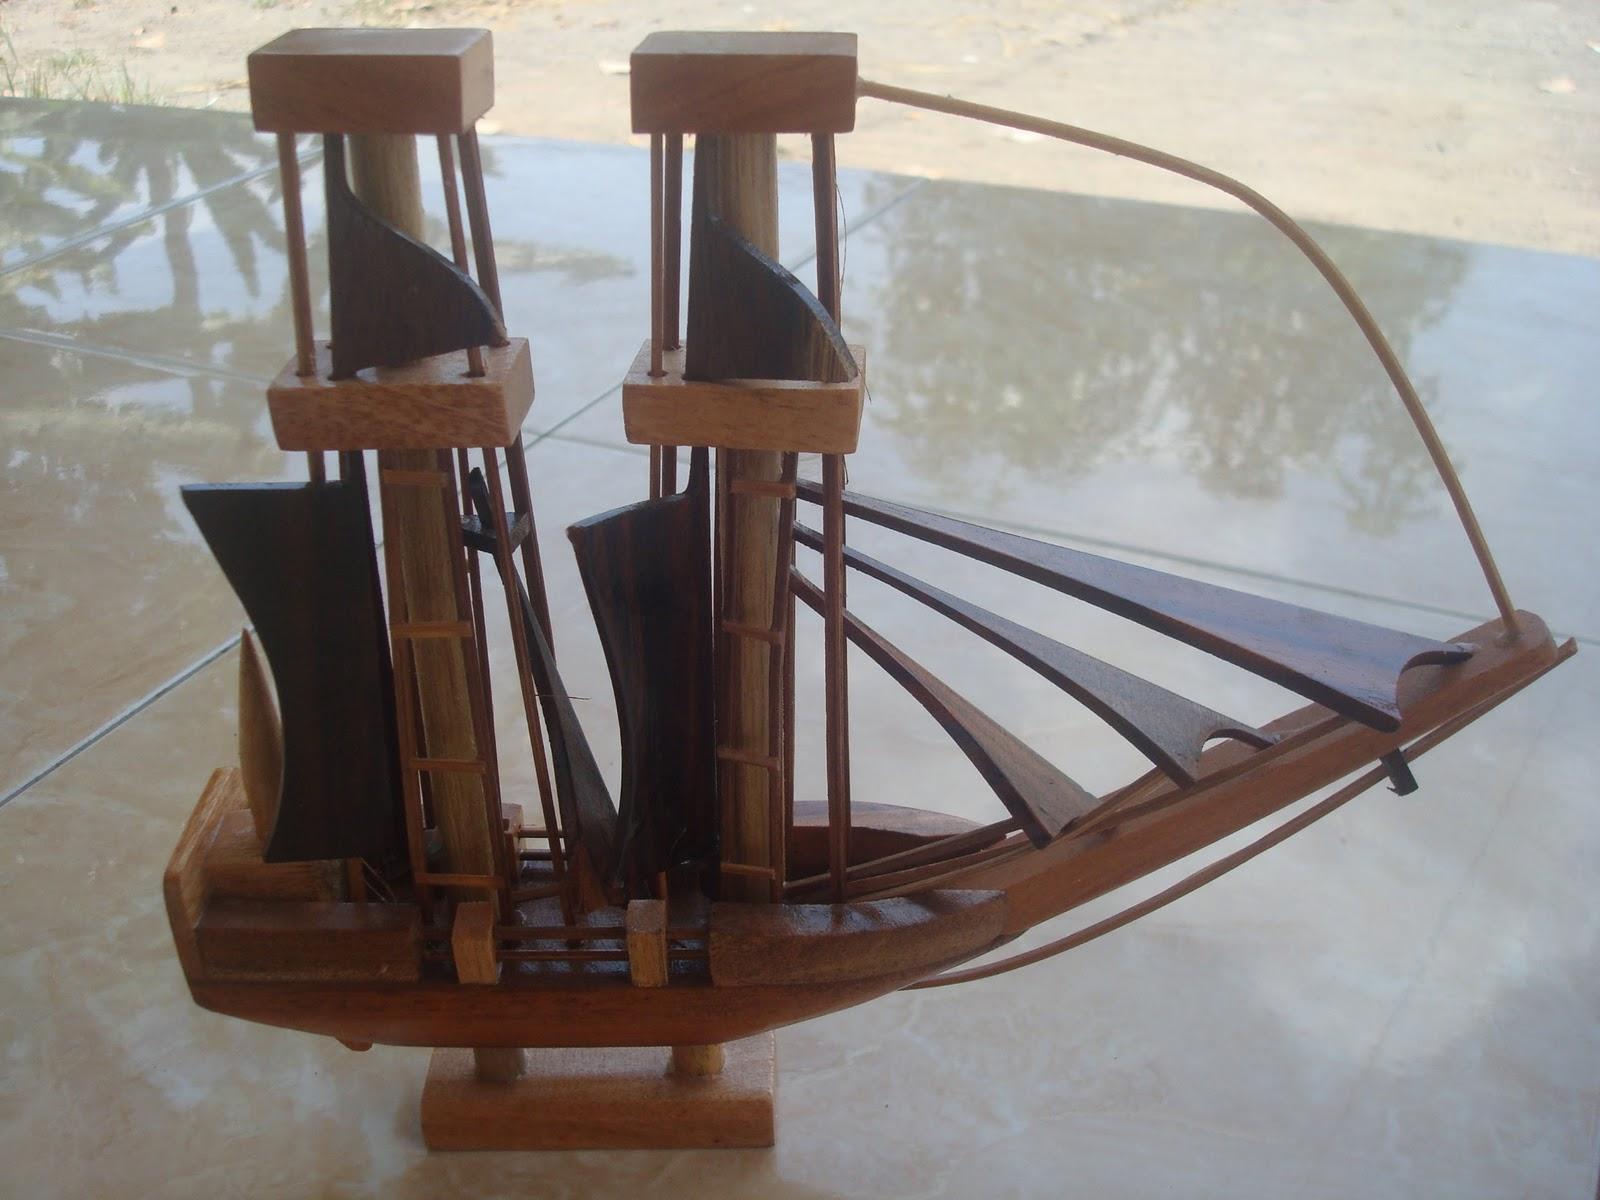 Gambar Kerajinan Kayu Perahu Layar